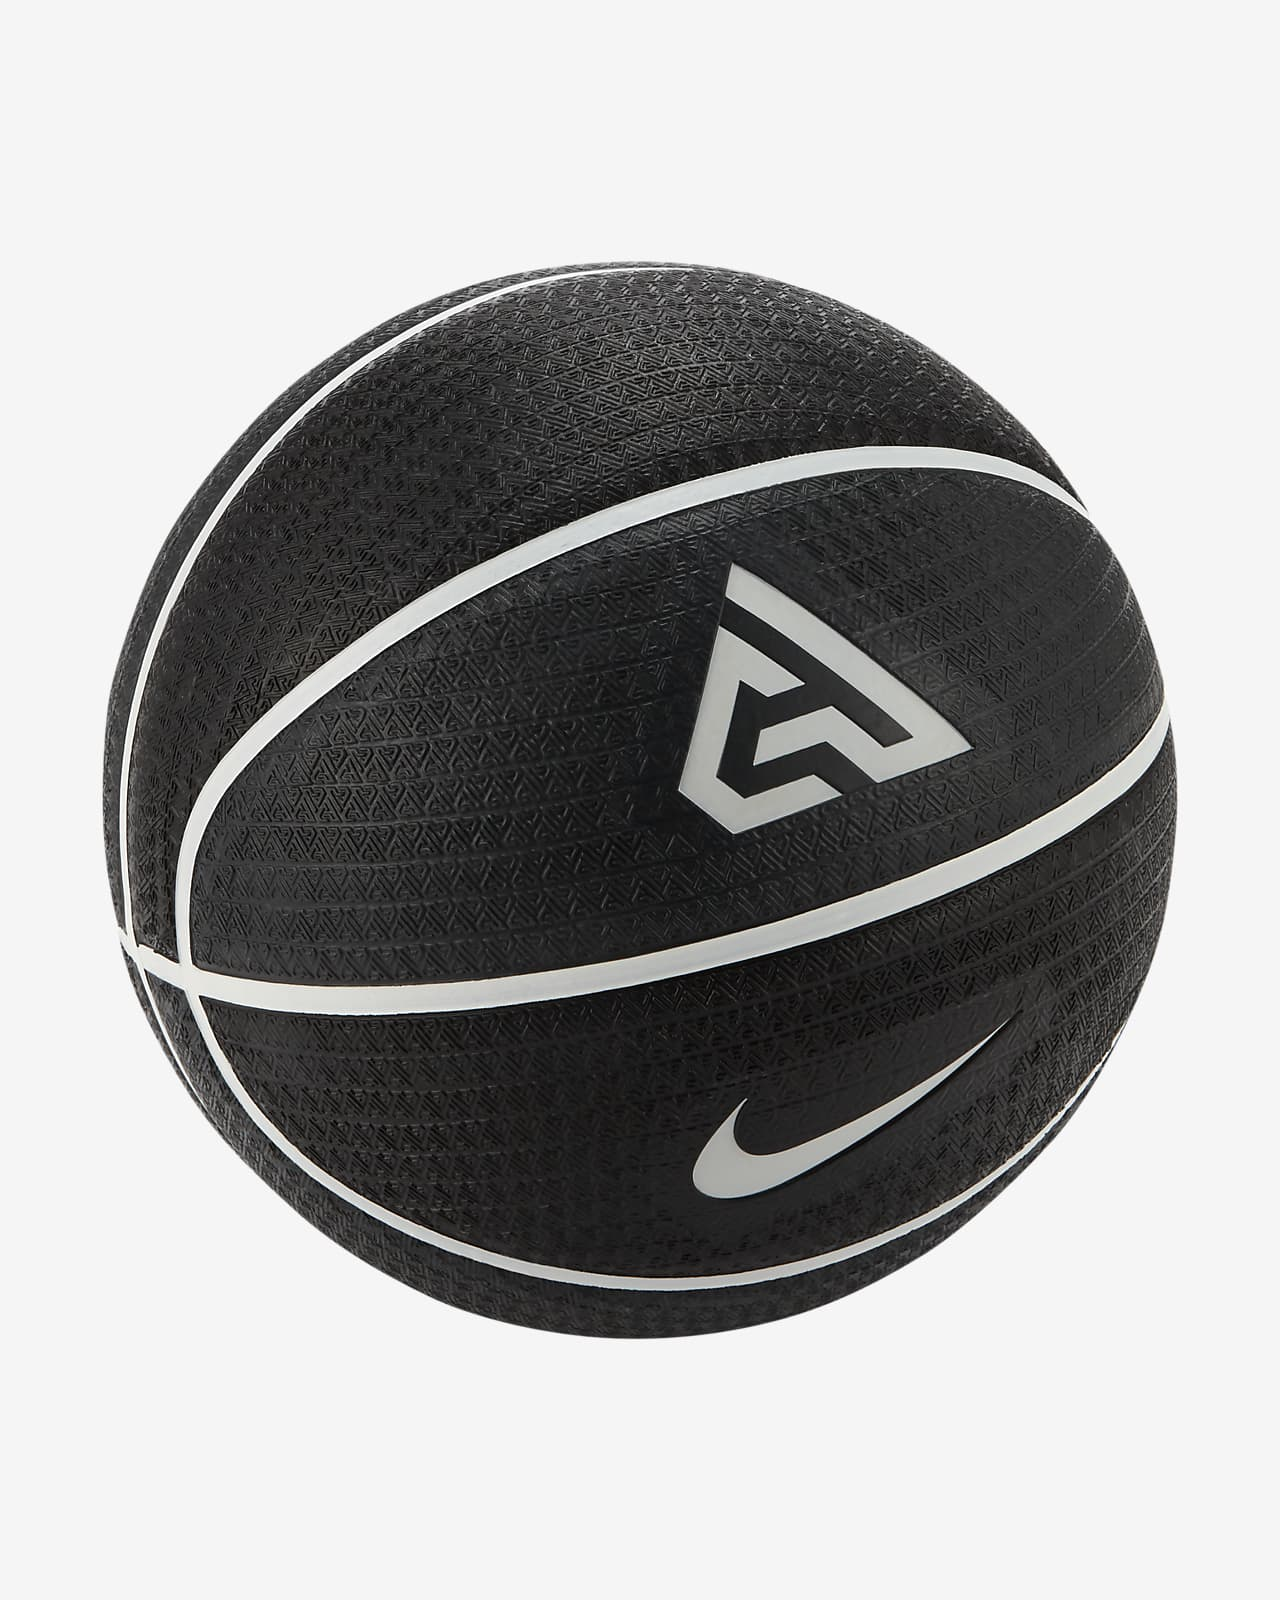 Giannis Playground 8P Basketbal